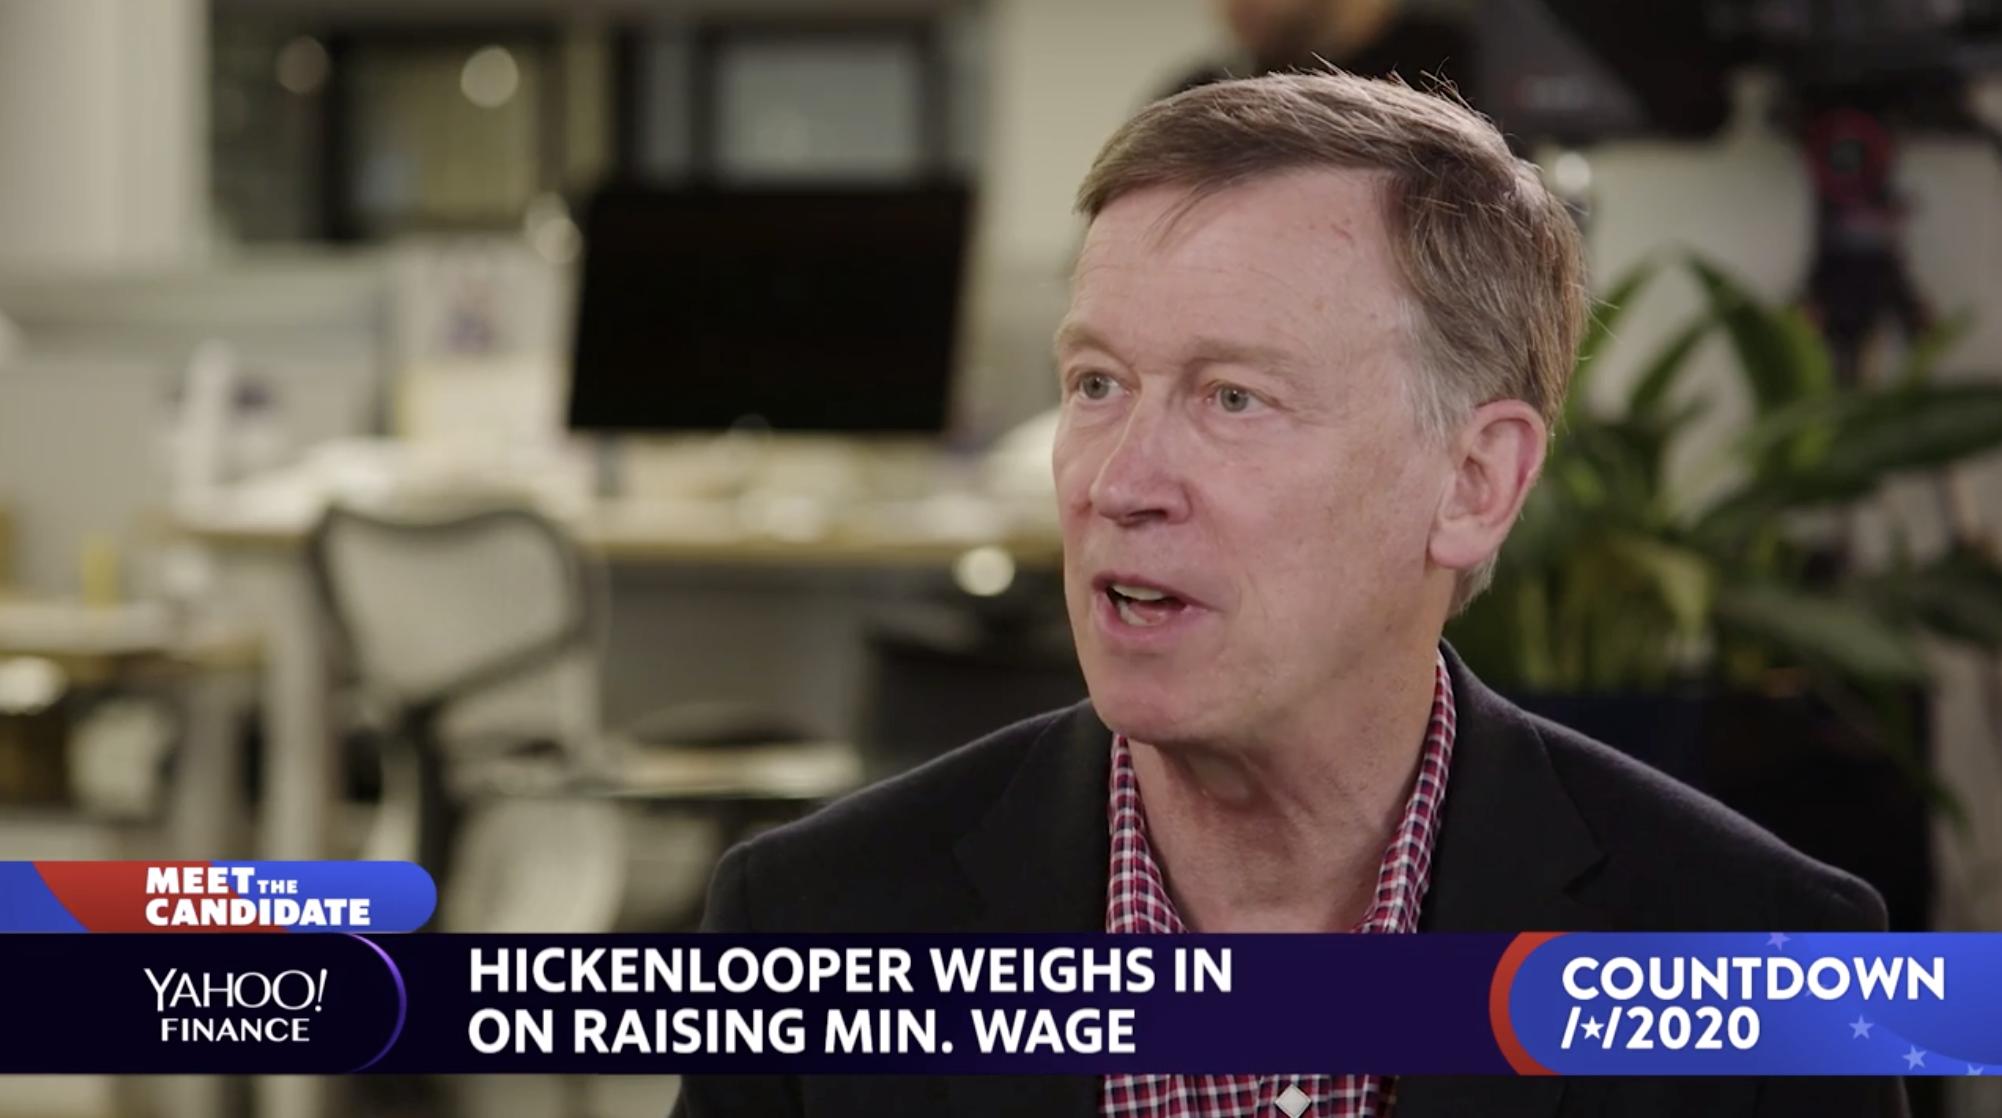 John Hickenlooper weighs in on raising the minimum wage